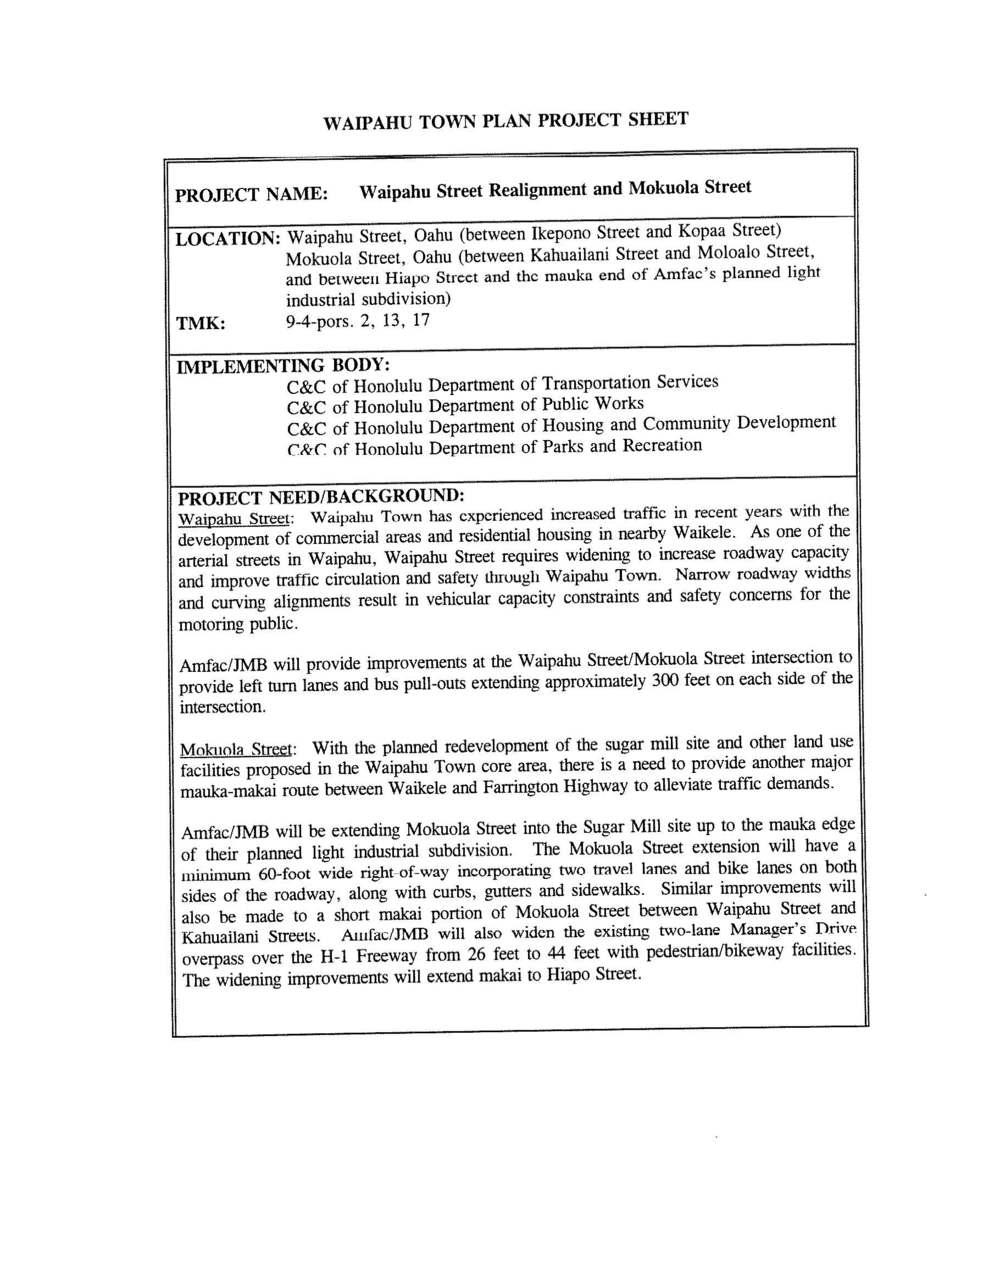 160531_WaipahuLivableCommunities(1998)_Page_136.jpg